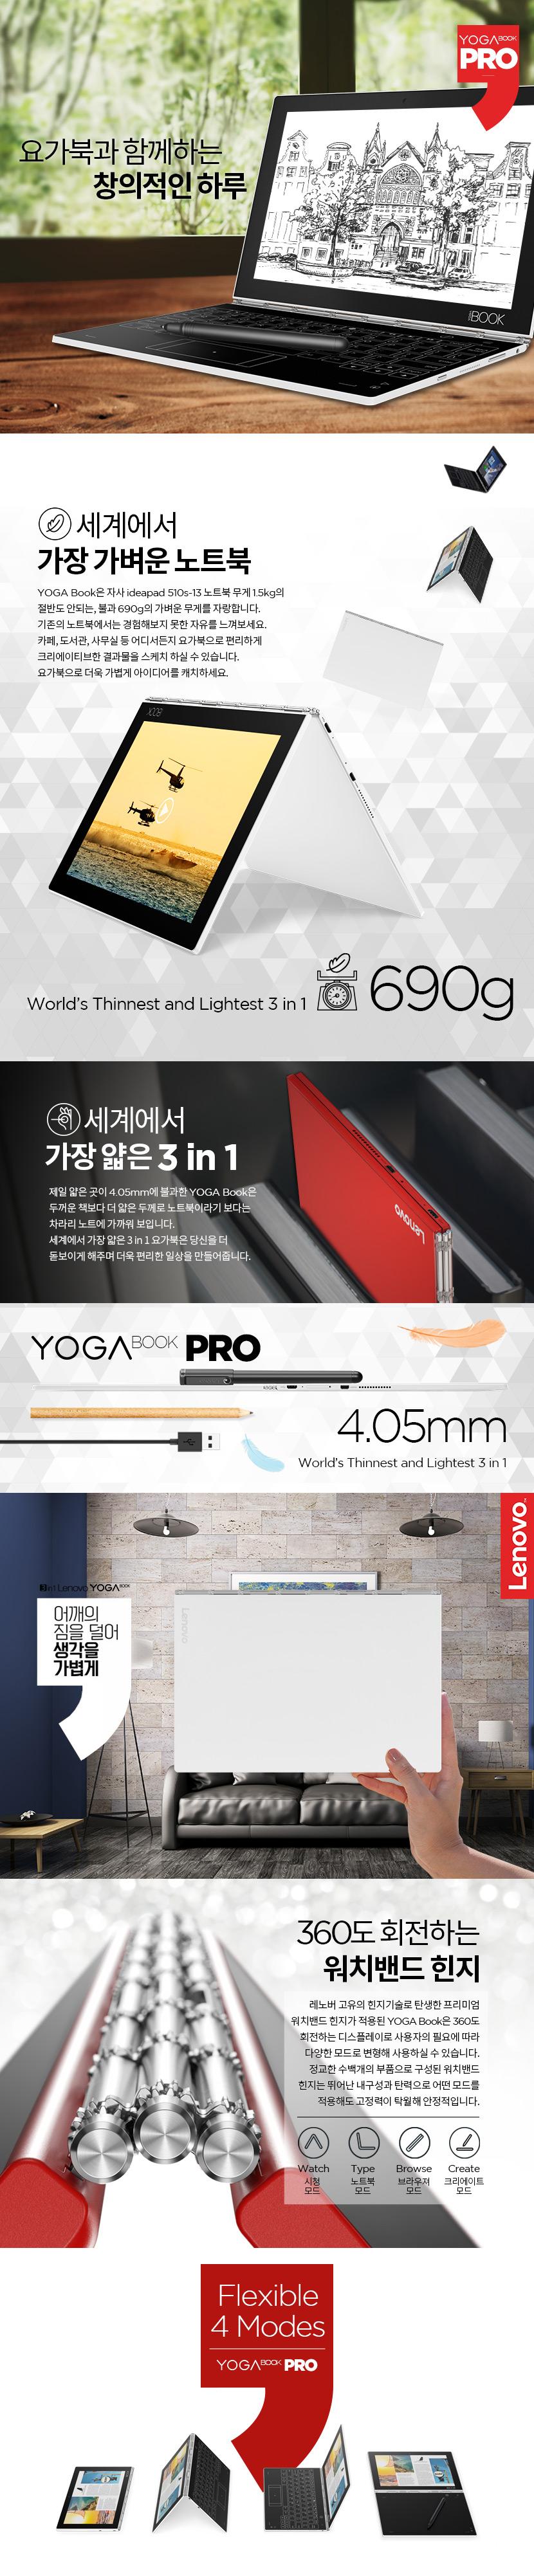 Yogabook_W_Pro_03